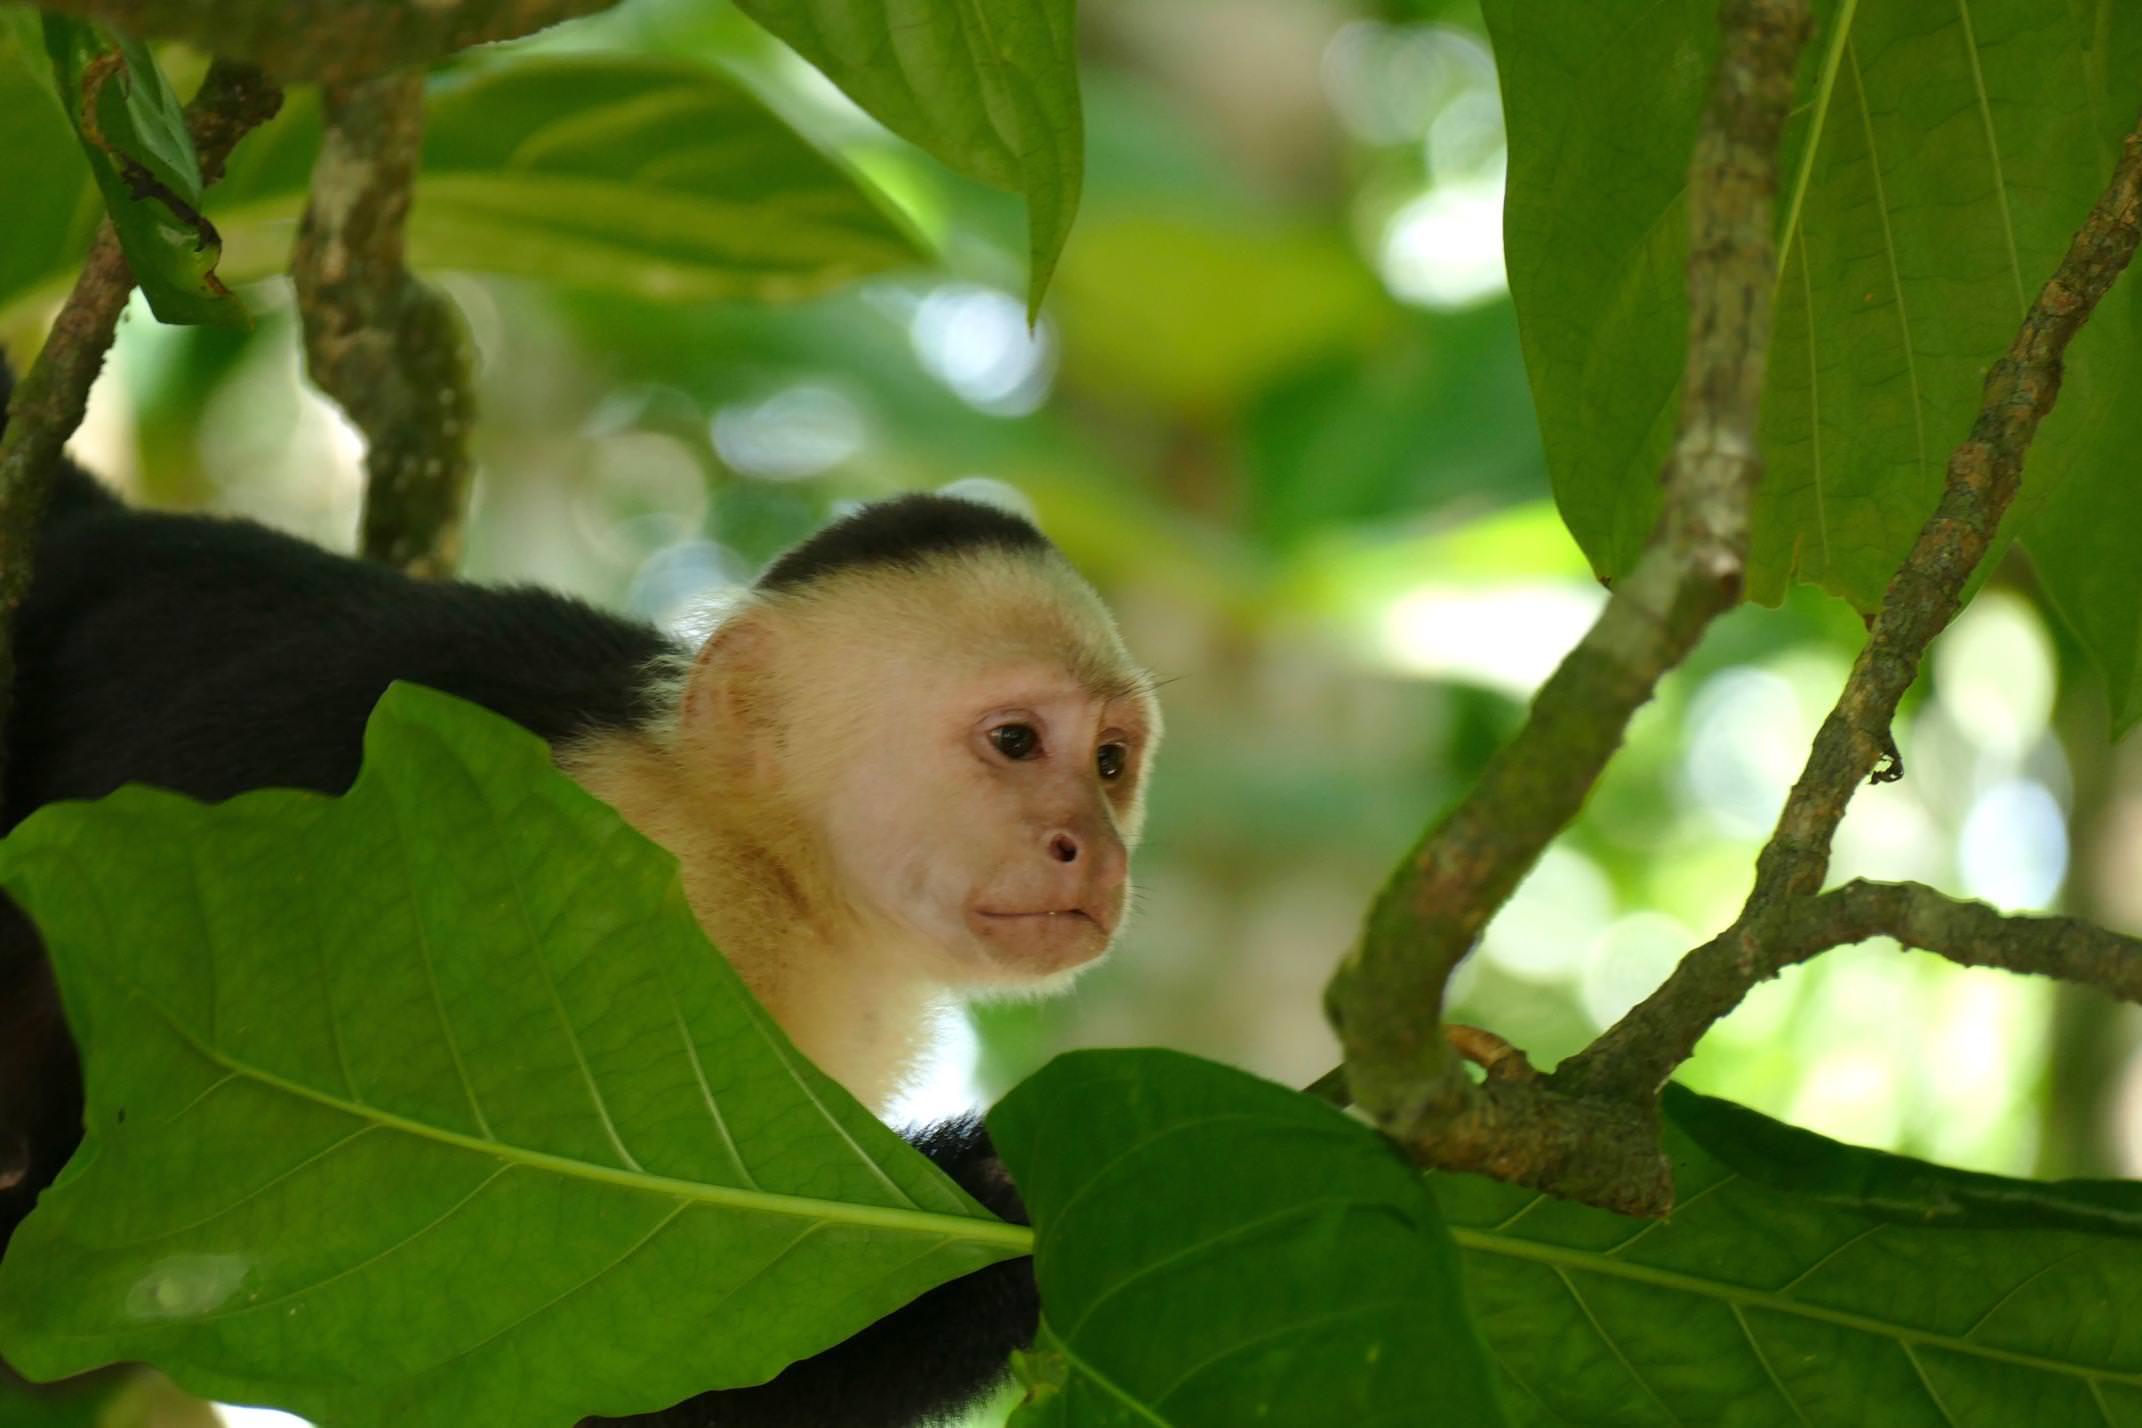 Costa rica caribbean cahuita national park white faced capuchin monkey 4